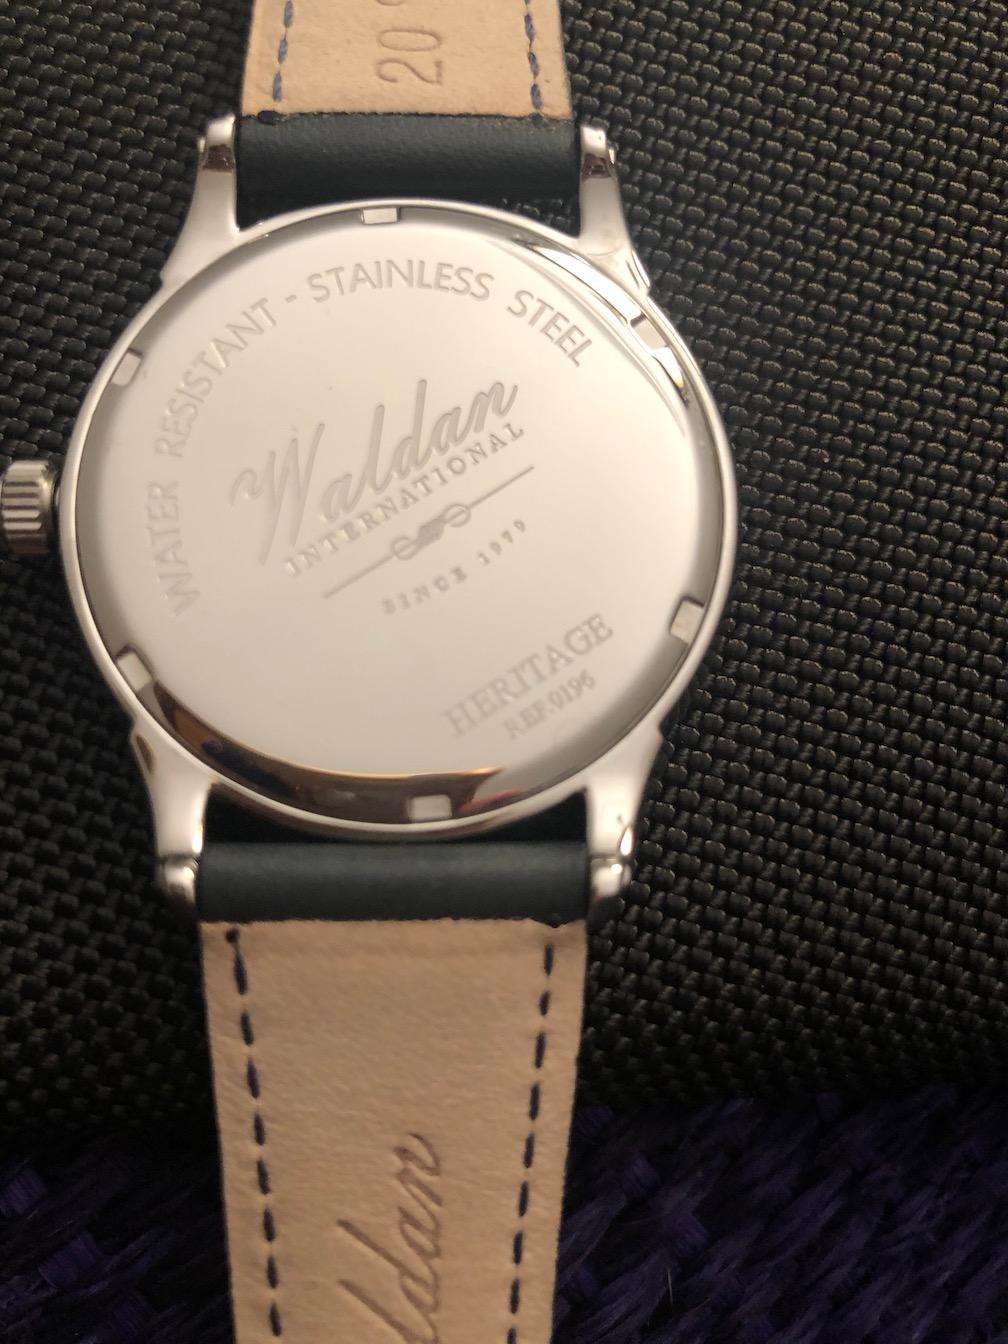 Waldan Heritage watches made in America